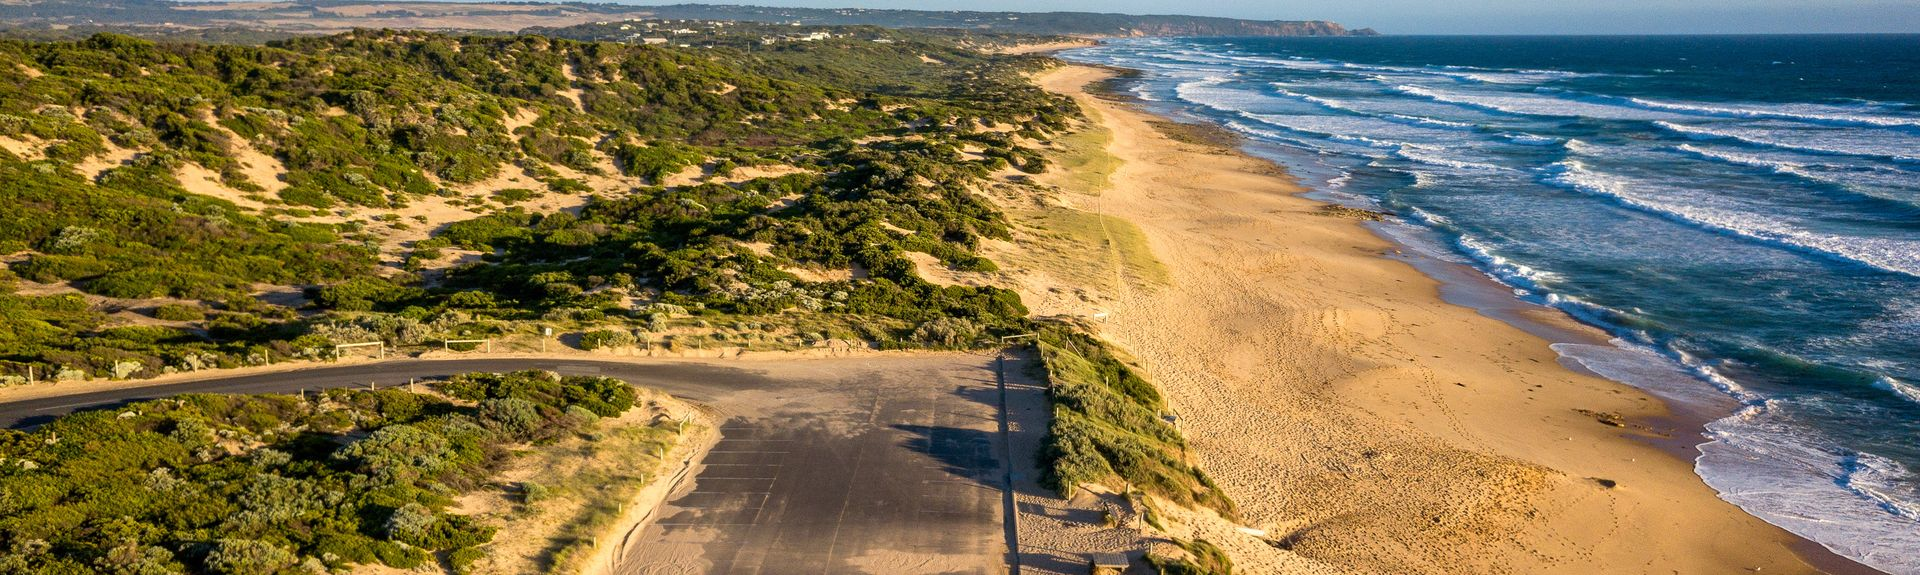 St. Andrews Beach, Melbourne, Victoria, Australië